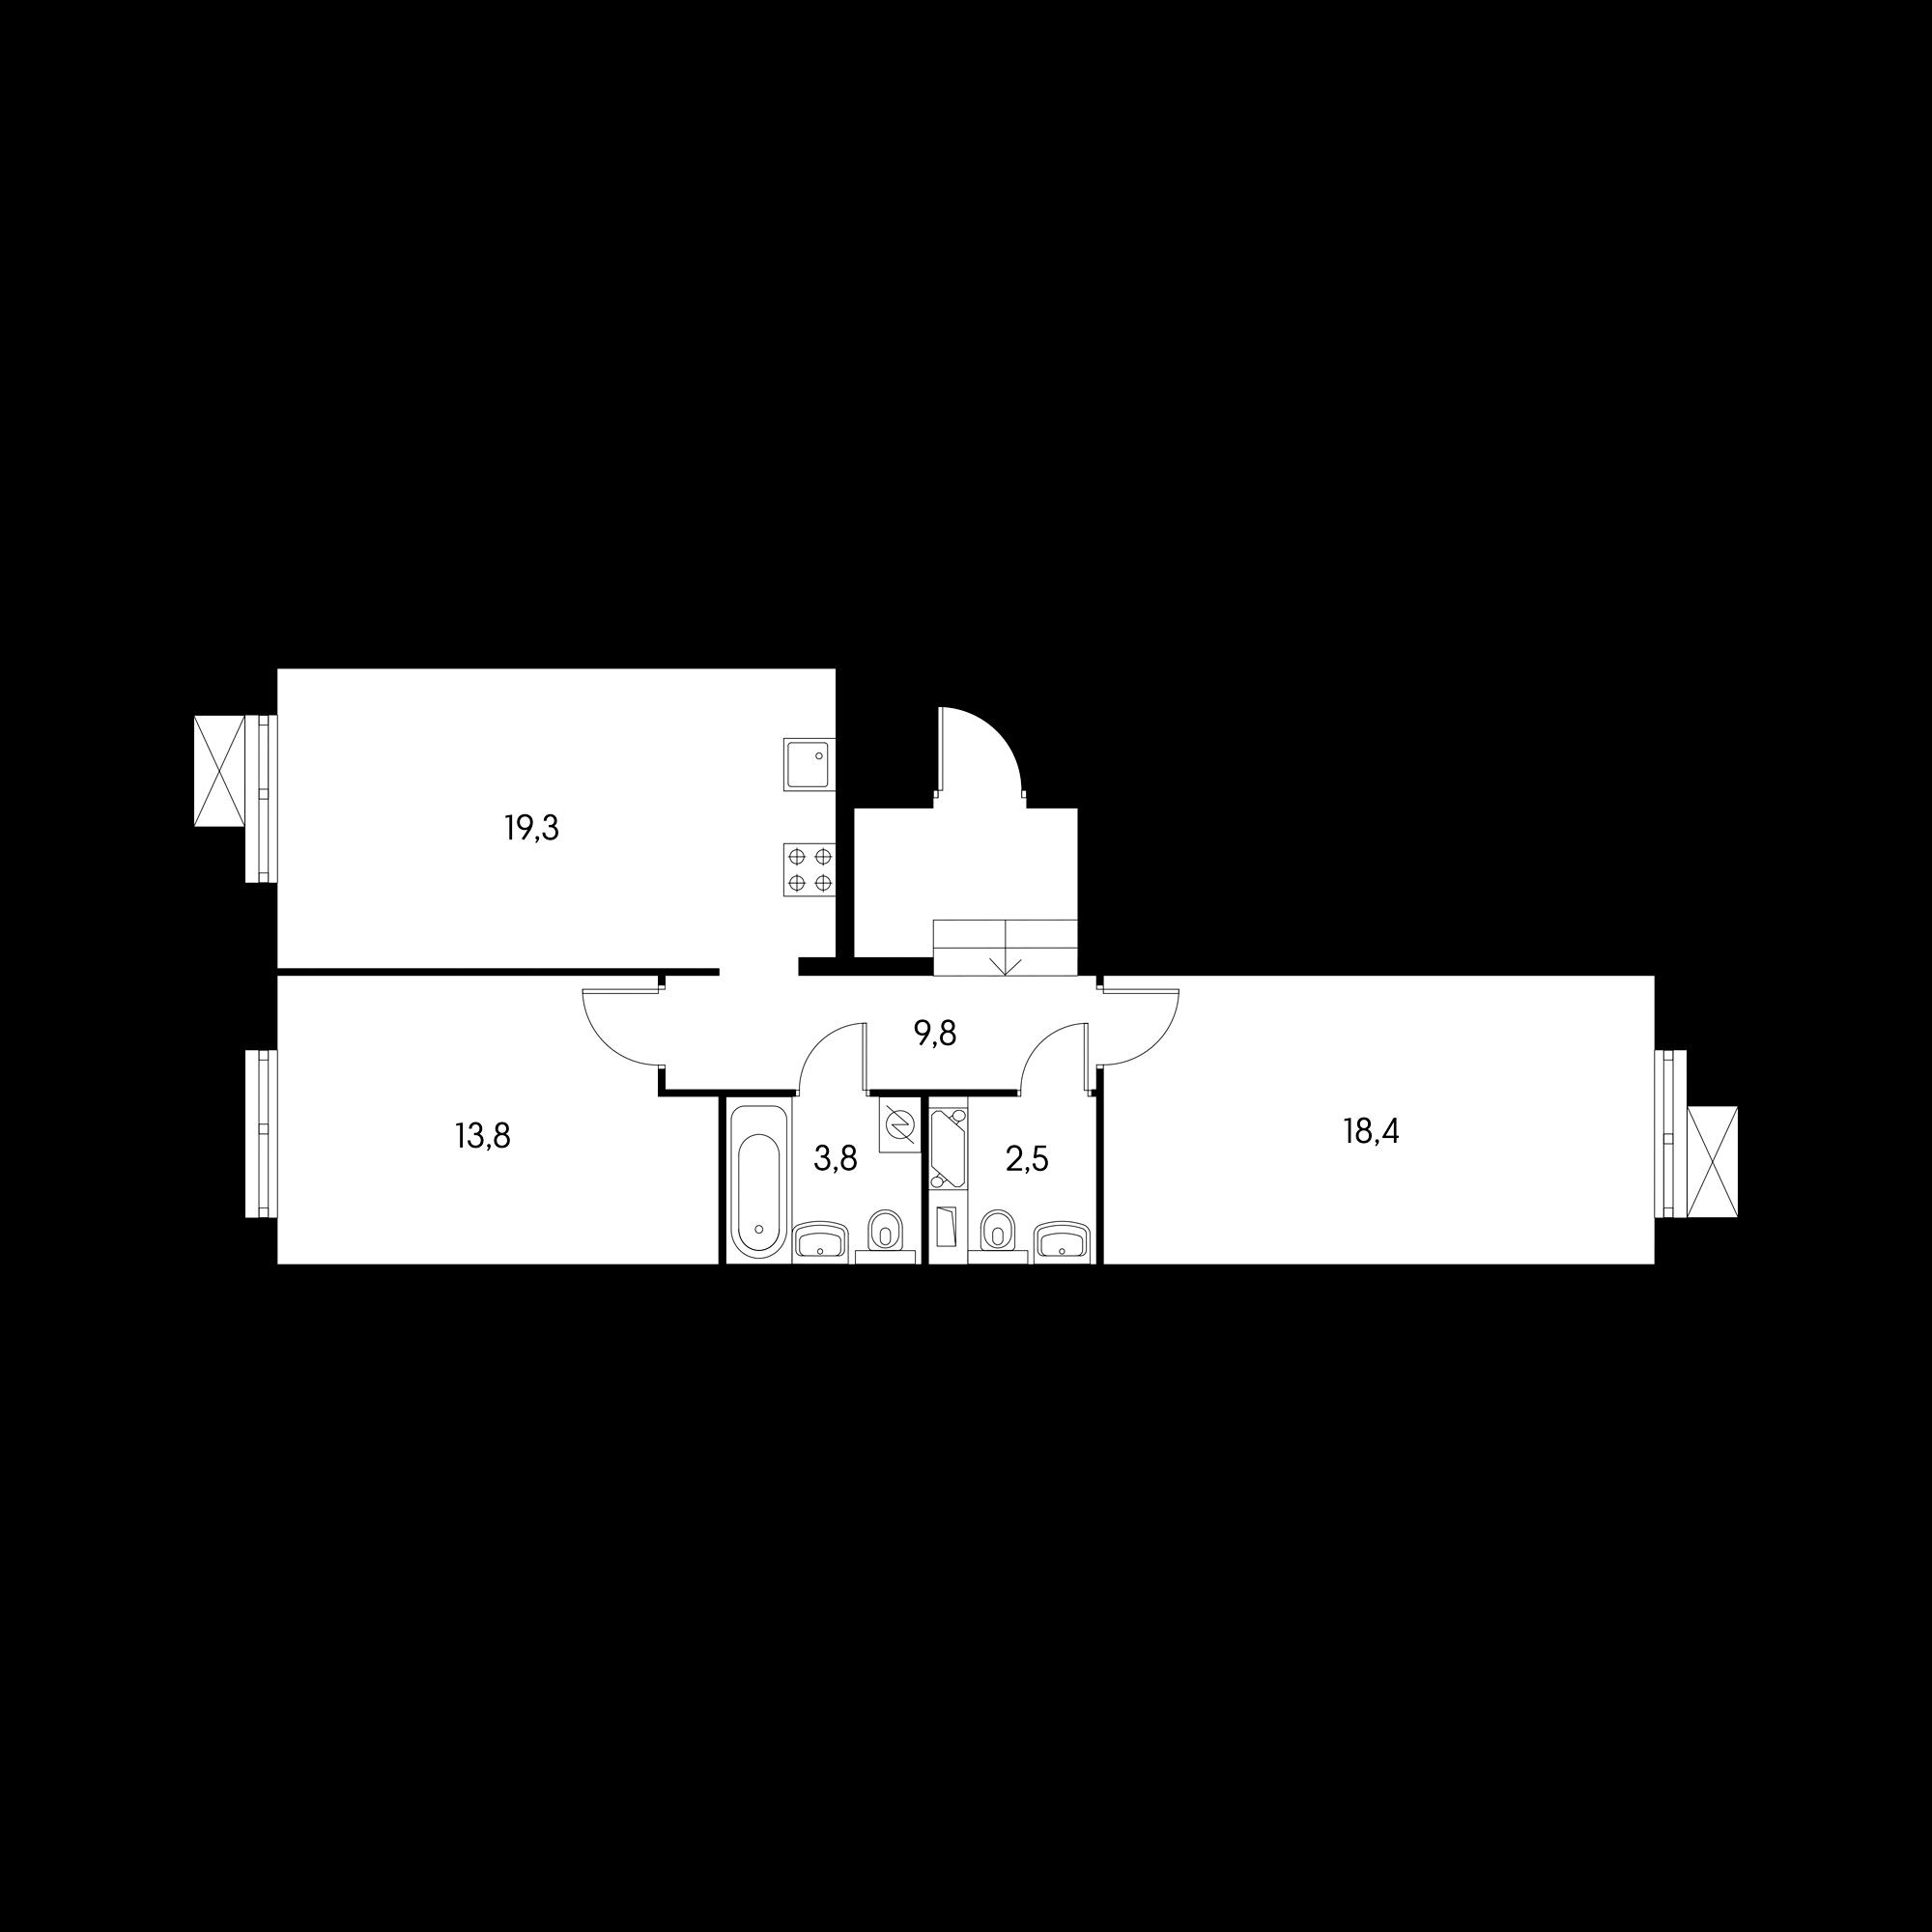 2-2_1(2)